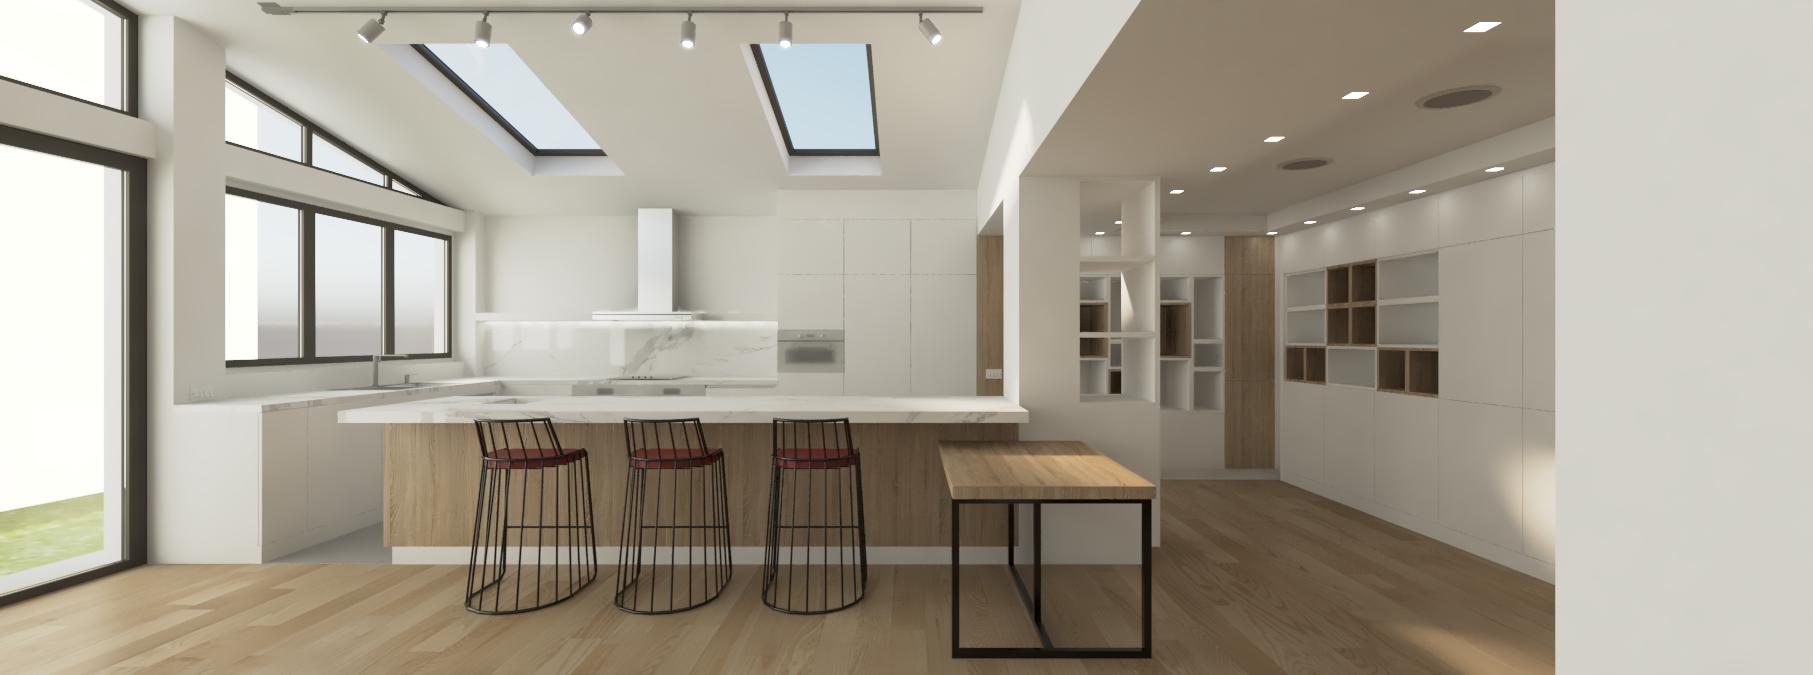 cucina con materiali ipotesi 1